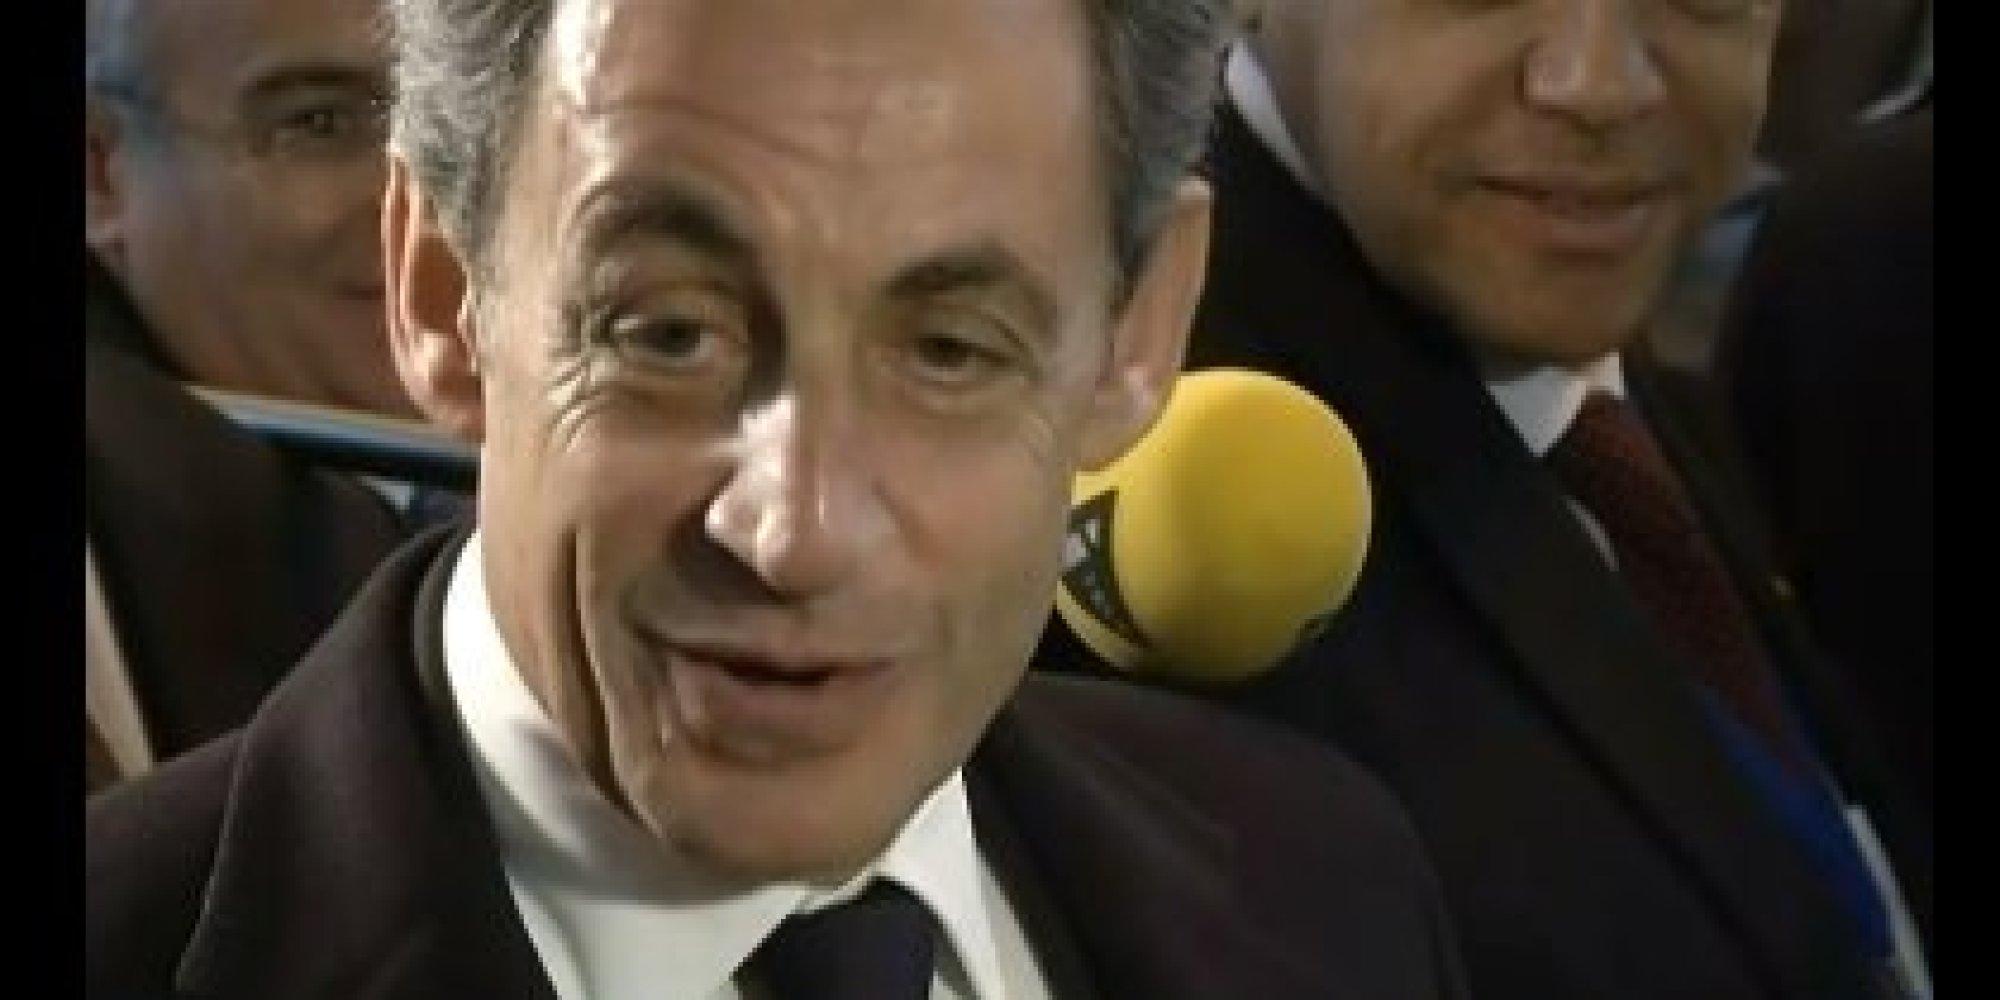 Nicolas sarkozy au salon de l 39 agriculture sa r ponse for Sarkozy salon agriculture